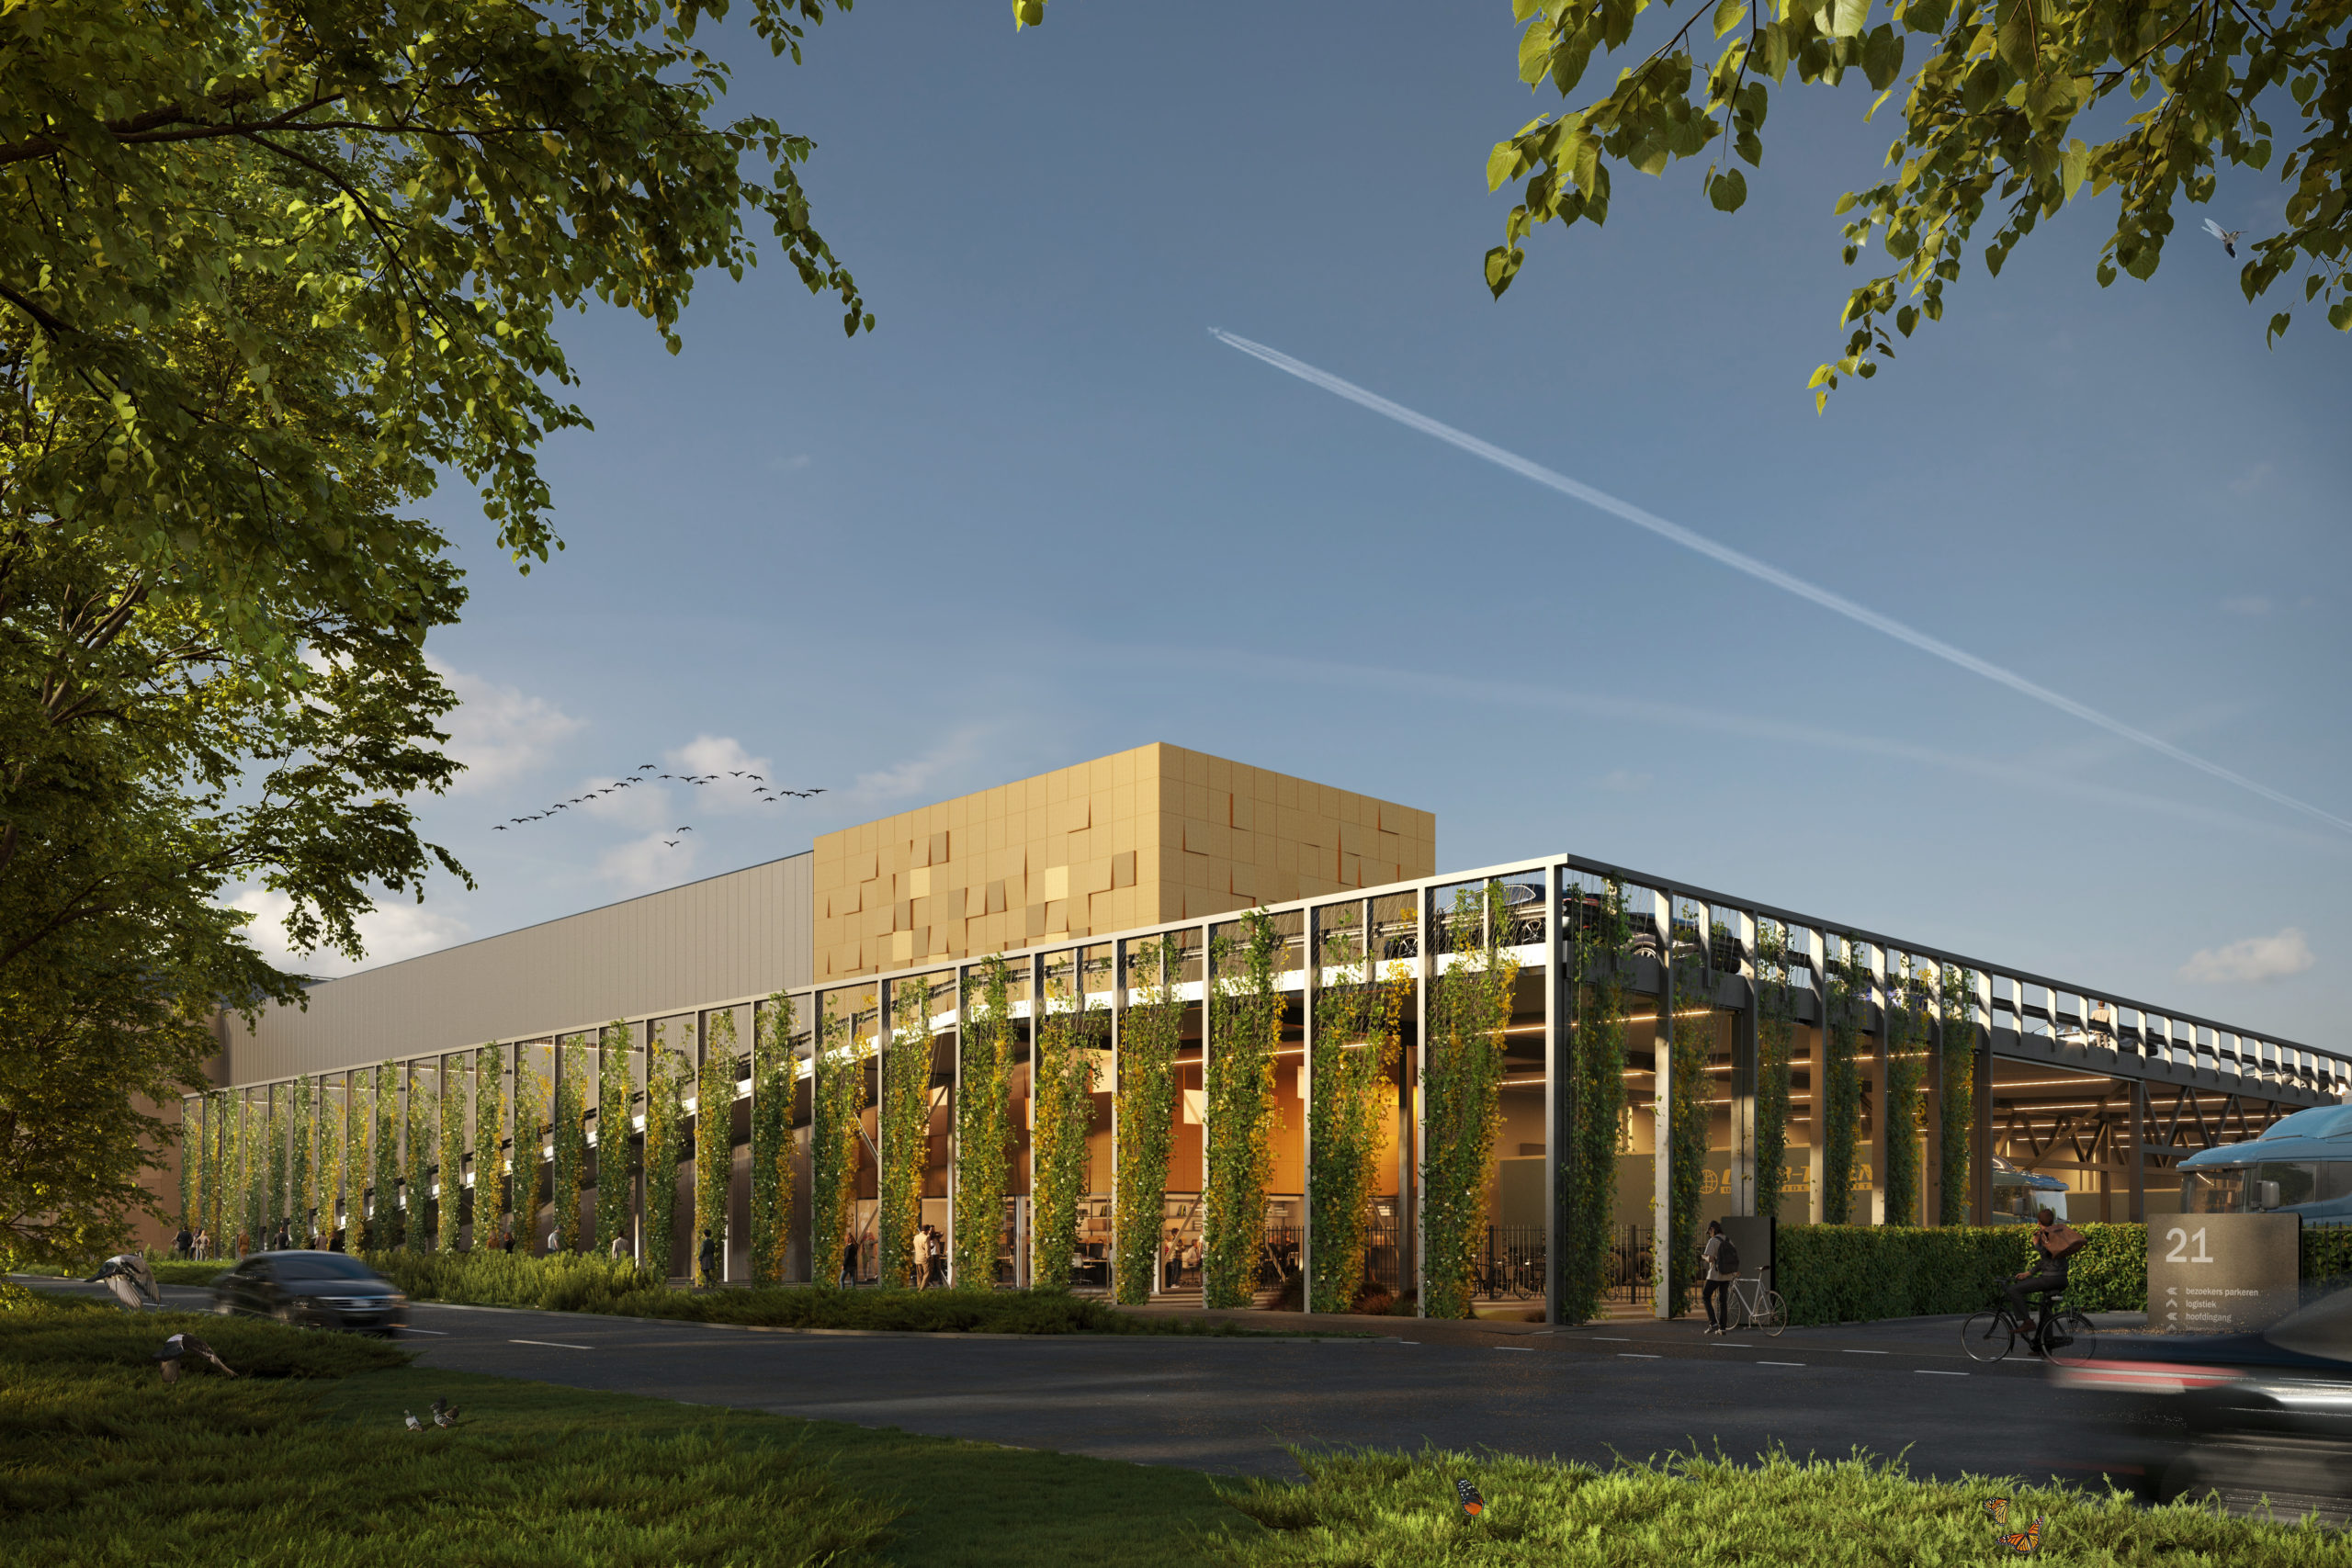 VDG Warehouse Schiphol